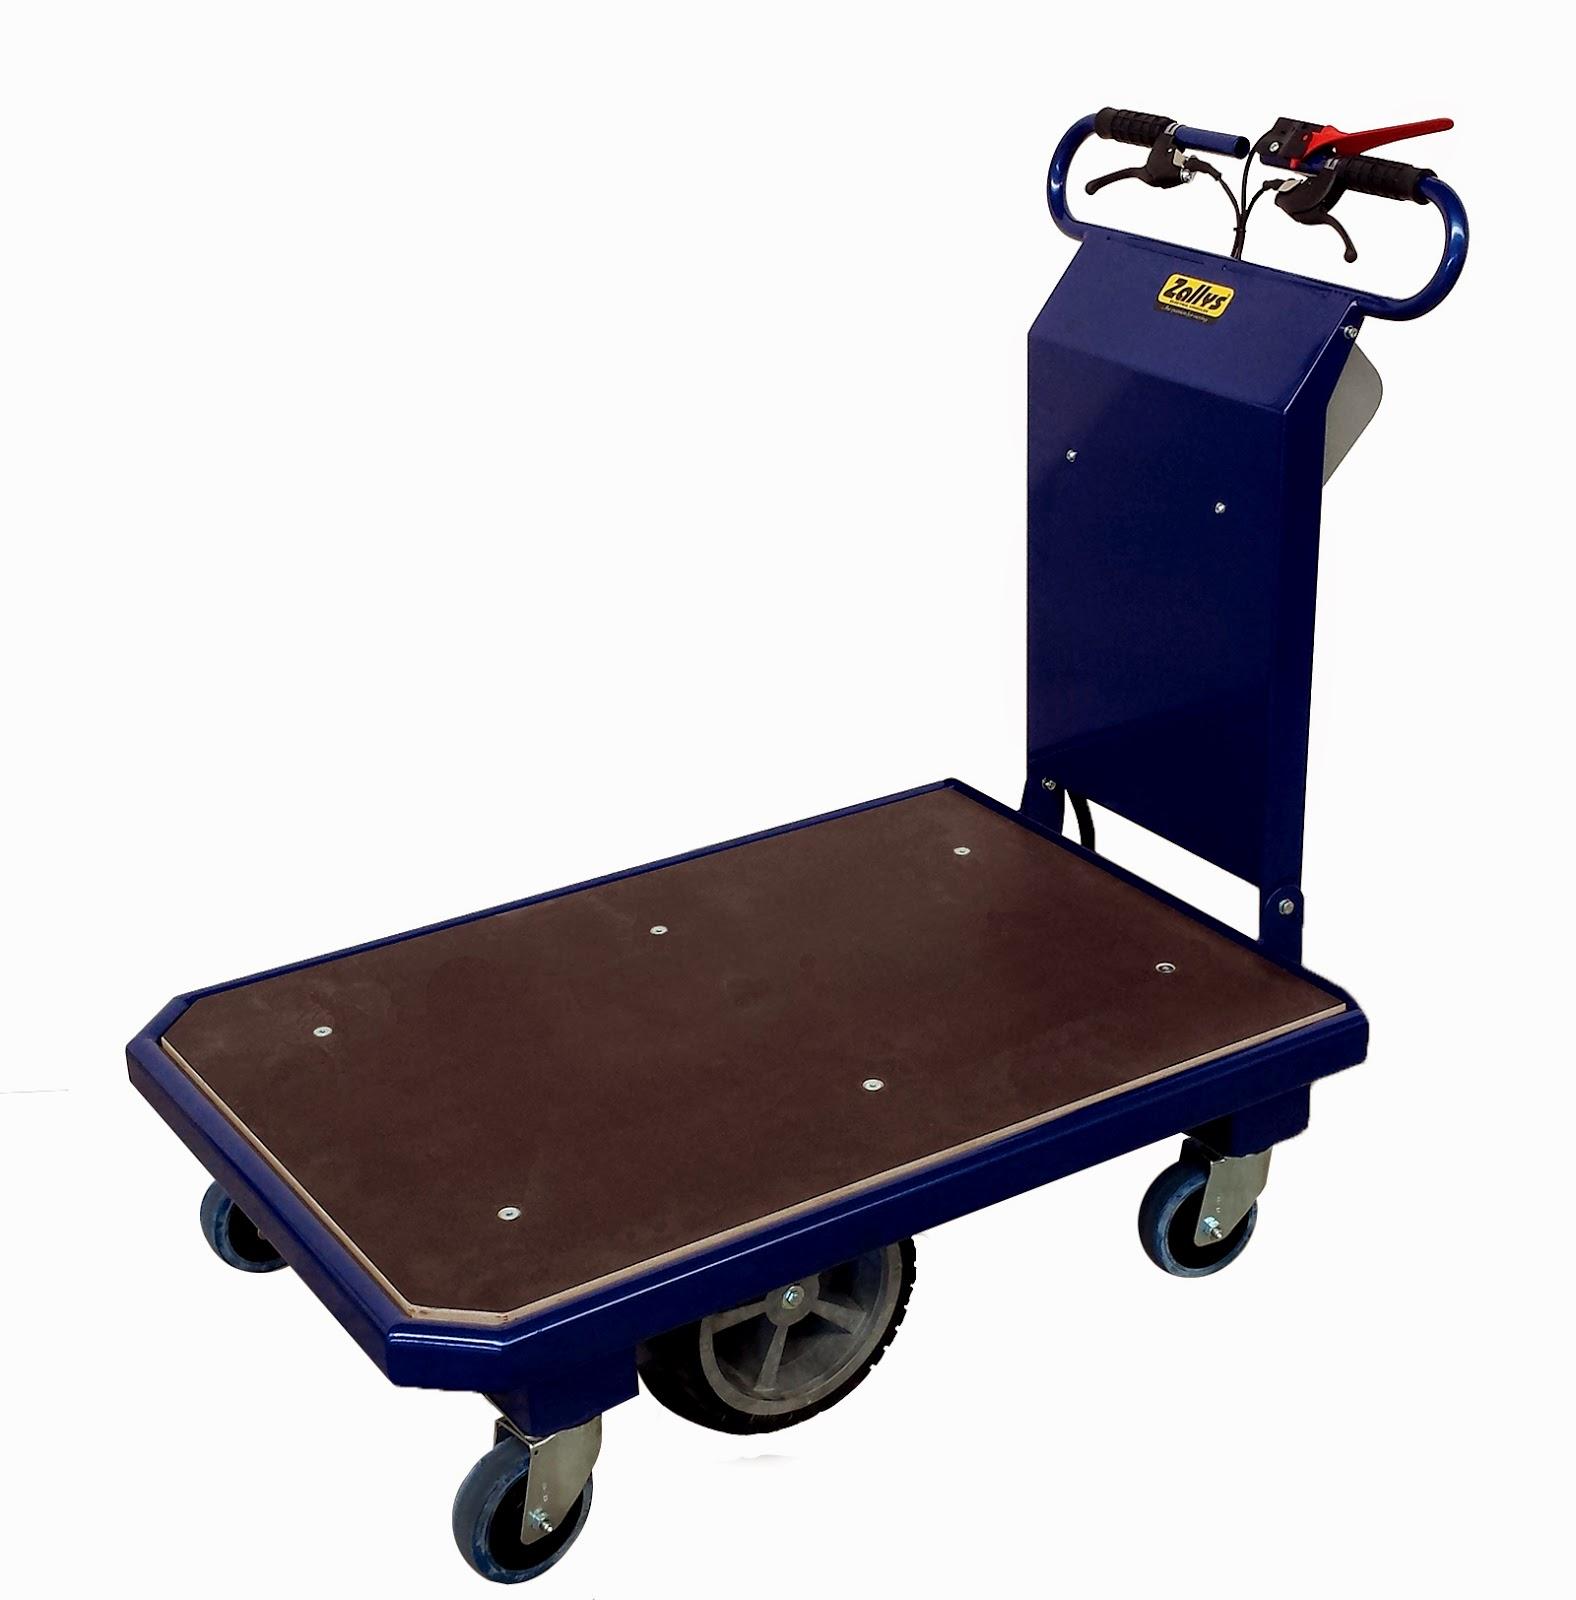 Motorized Cart Zallys M15 Electric Piowered Platform Trolley